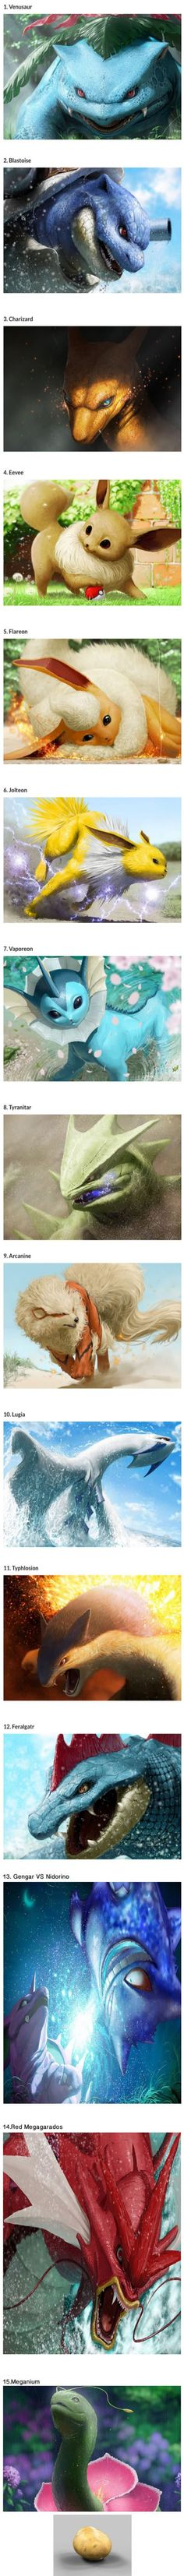 Japanese artist creates breathtaking realistic Pokemon paintings